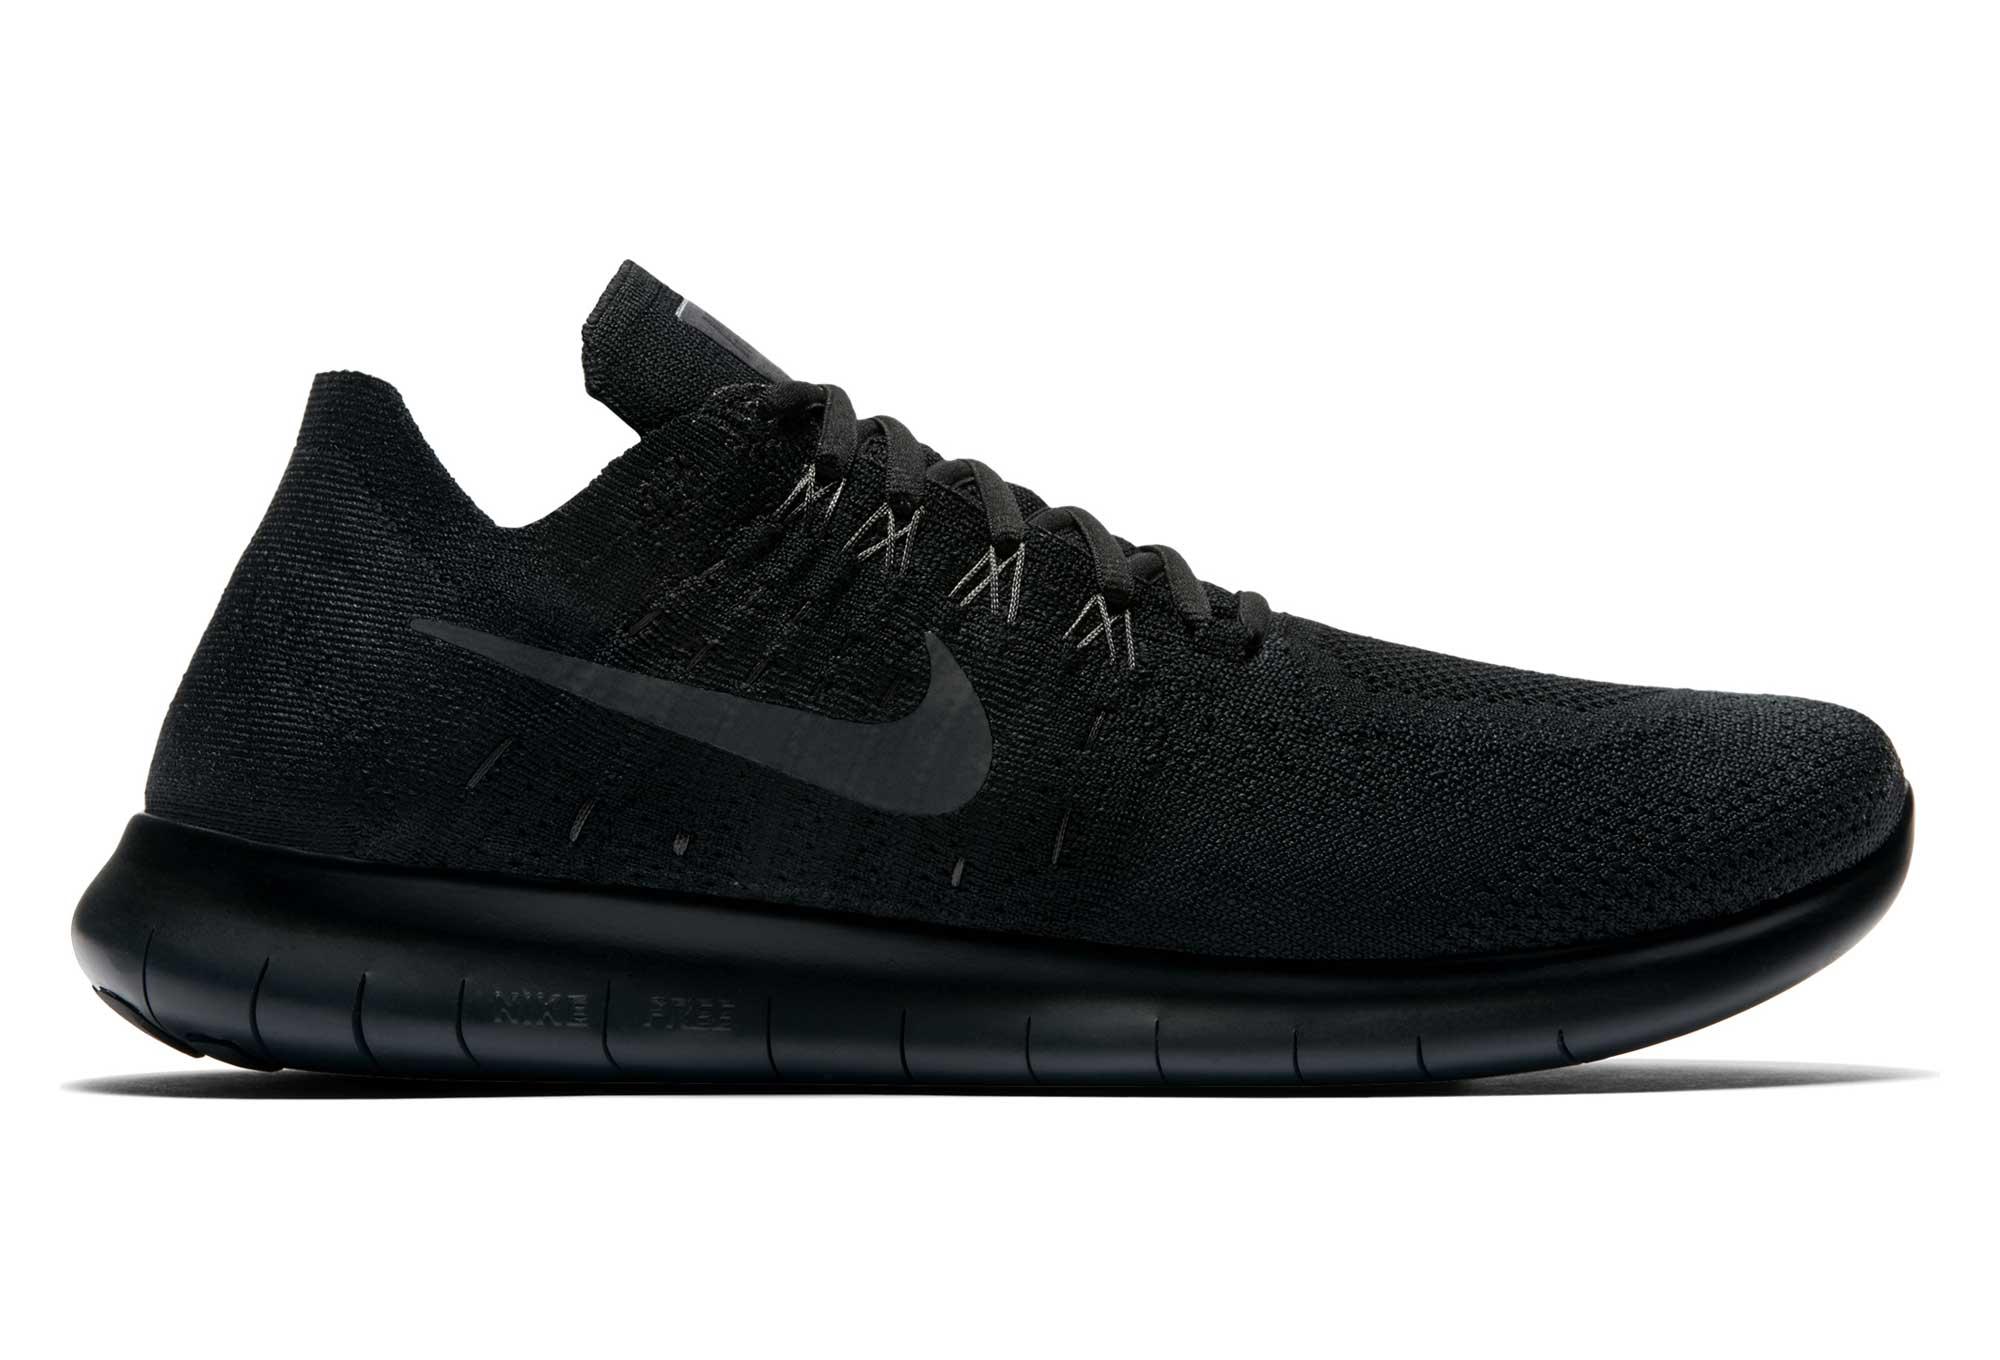 Chaussures de Running Femme Nike Free RN Flyknit 2017 Noir Gris Anthracite